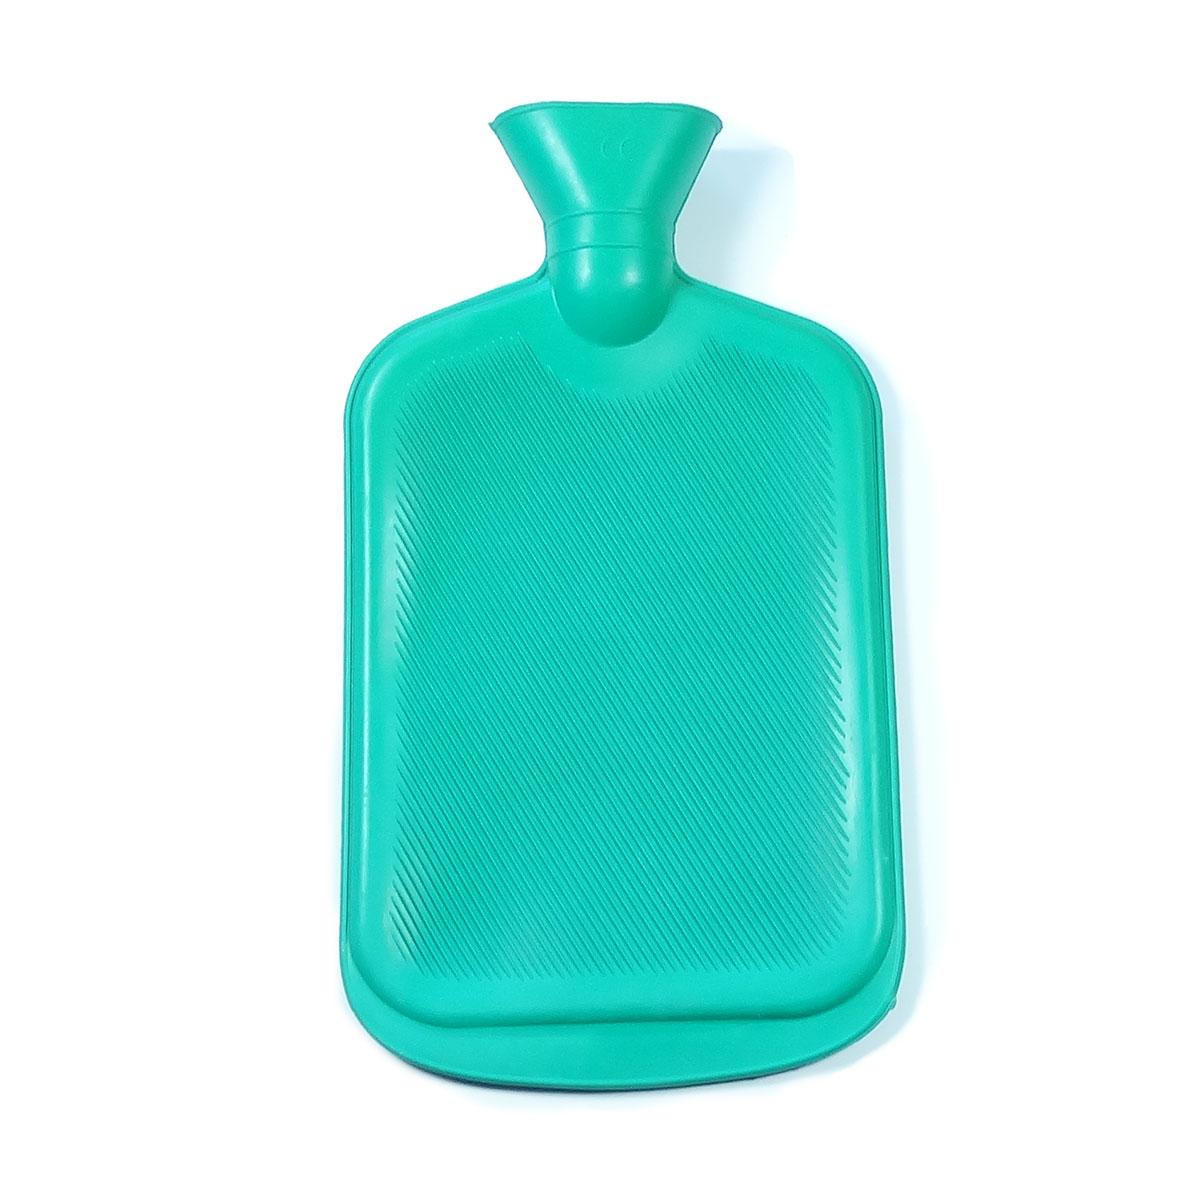 Hot water bag green - Sayoni Care